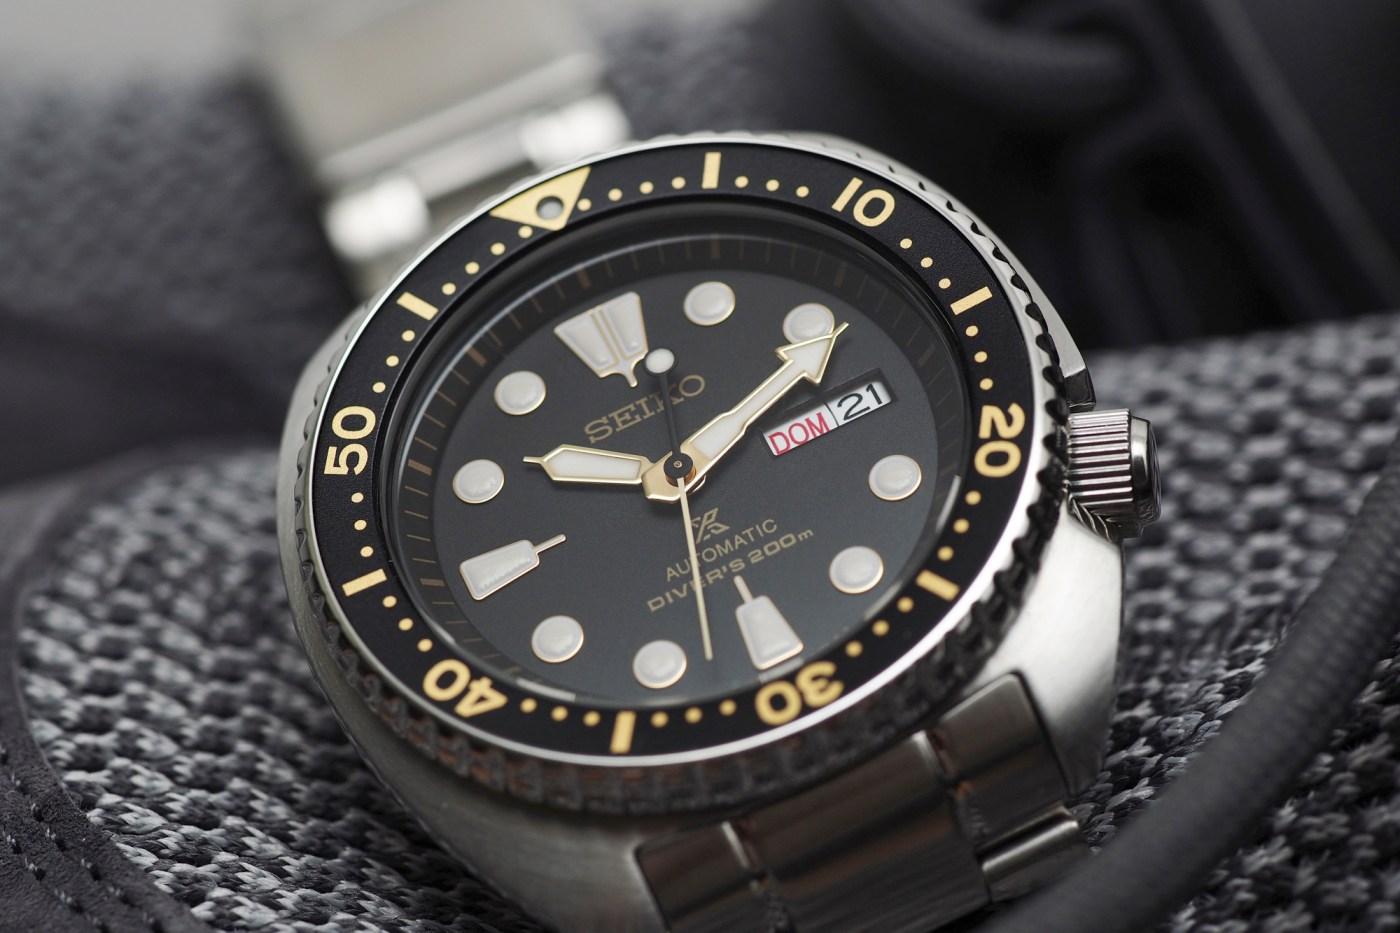 Seiko Turtle Dive watch